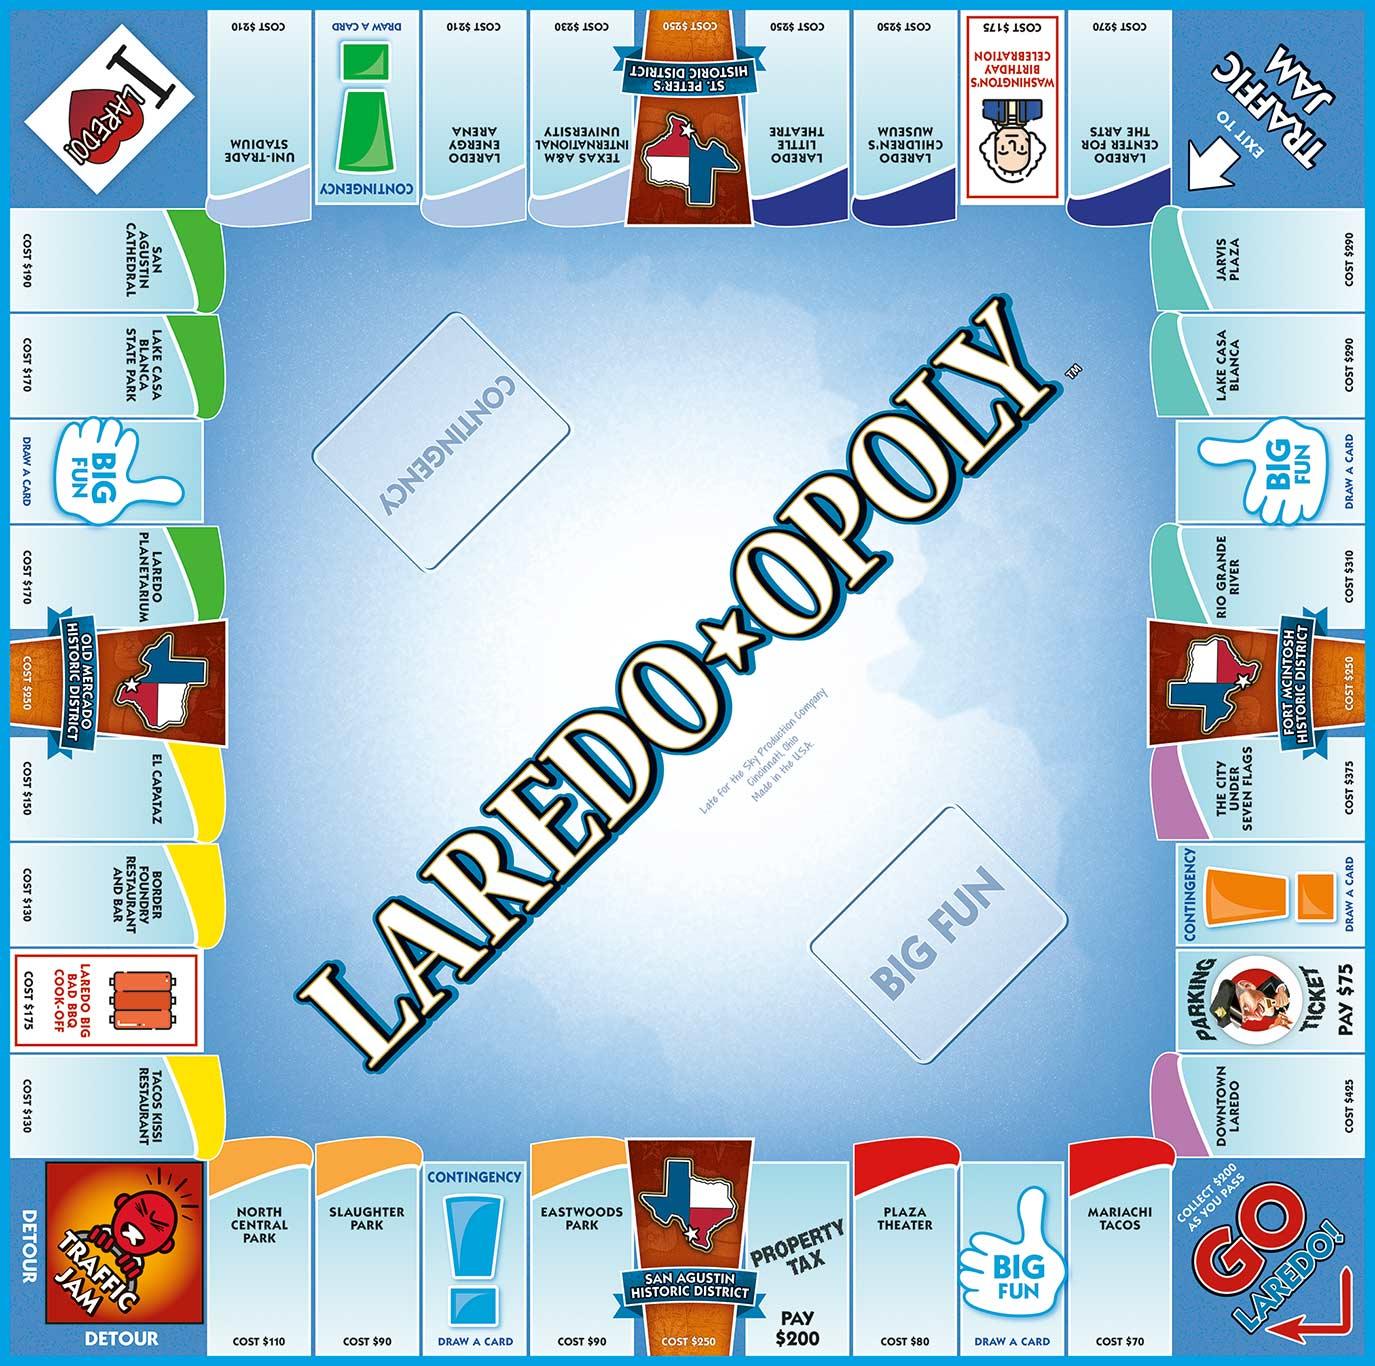 LAREDO-OPOLY Board Game